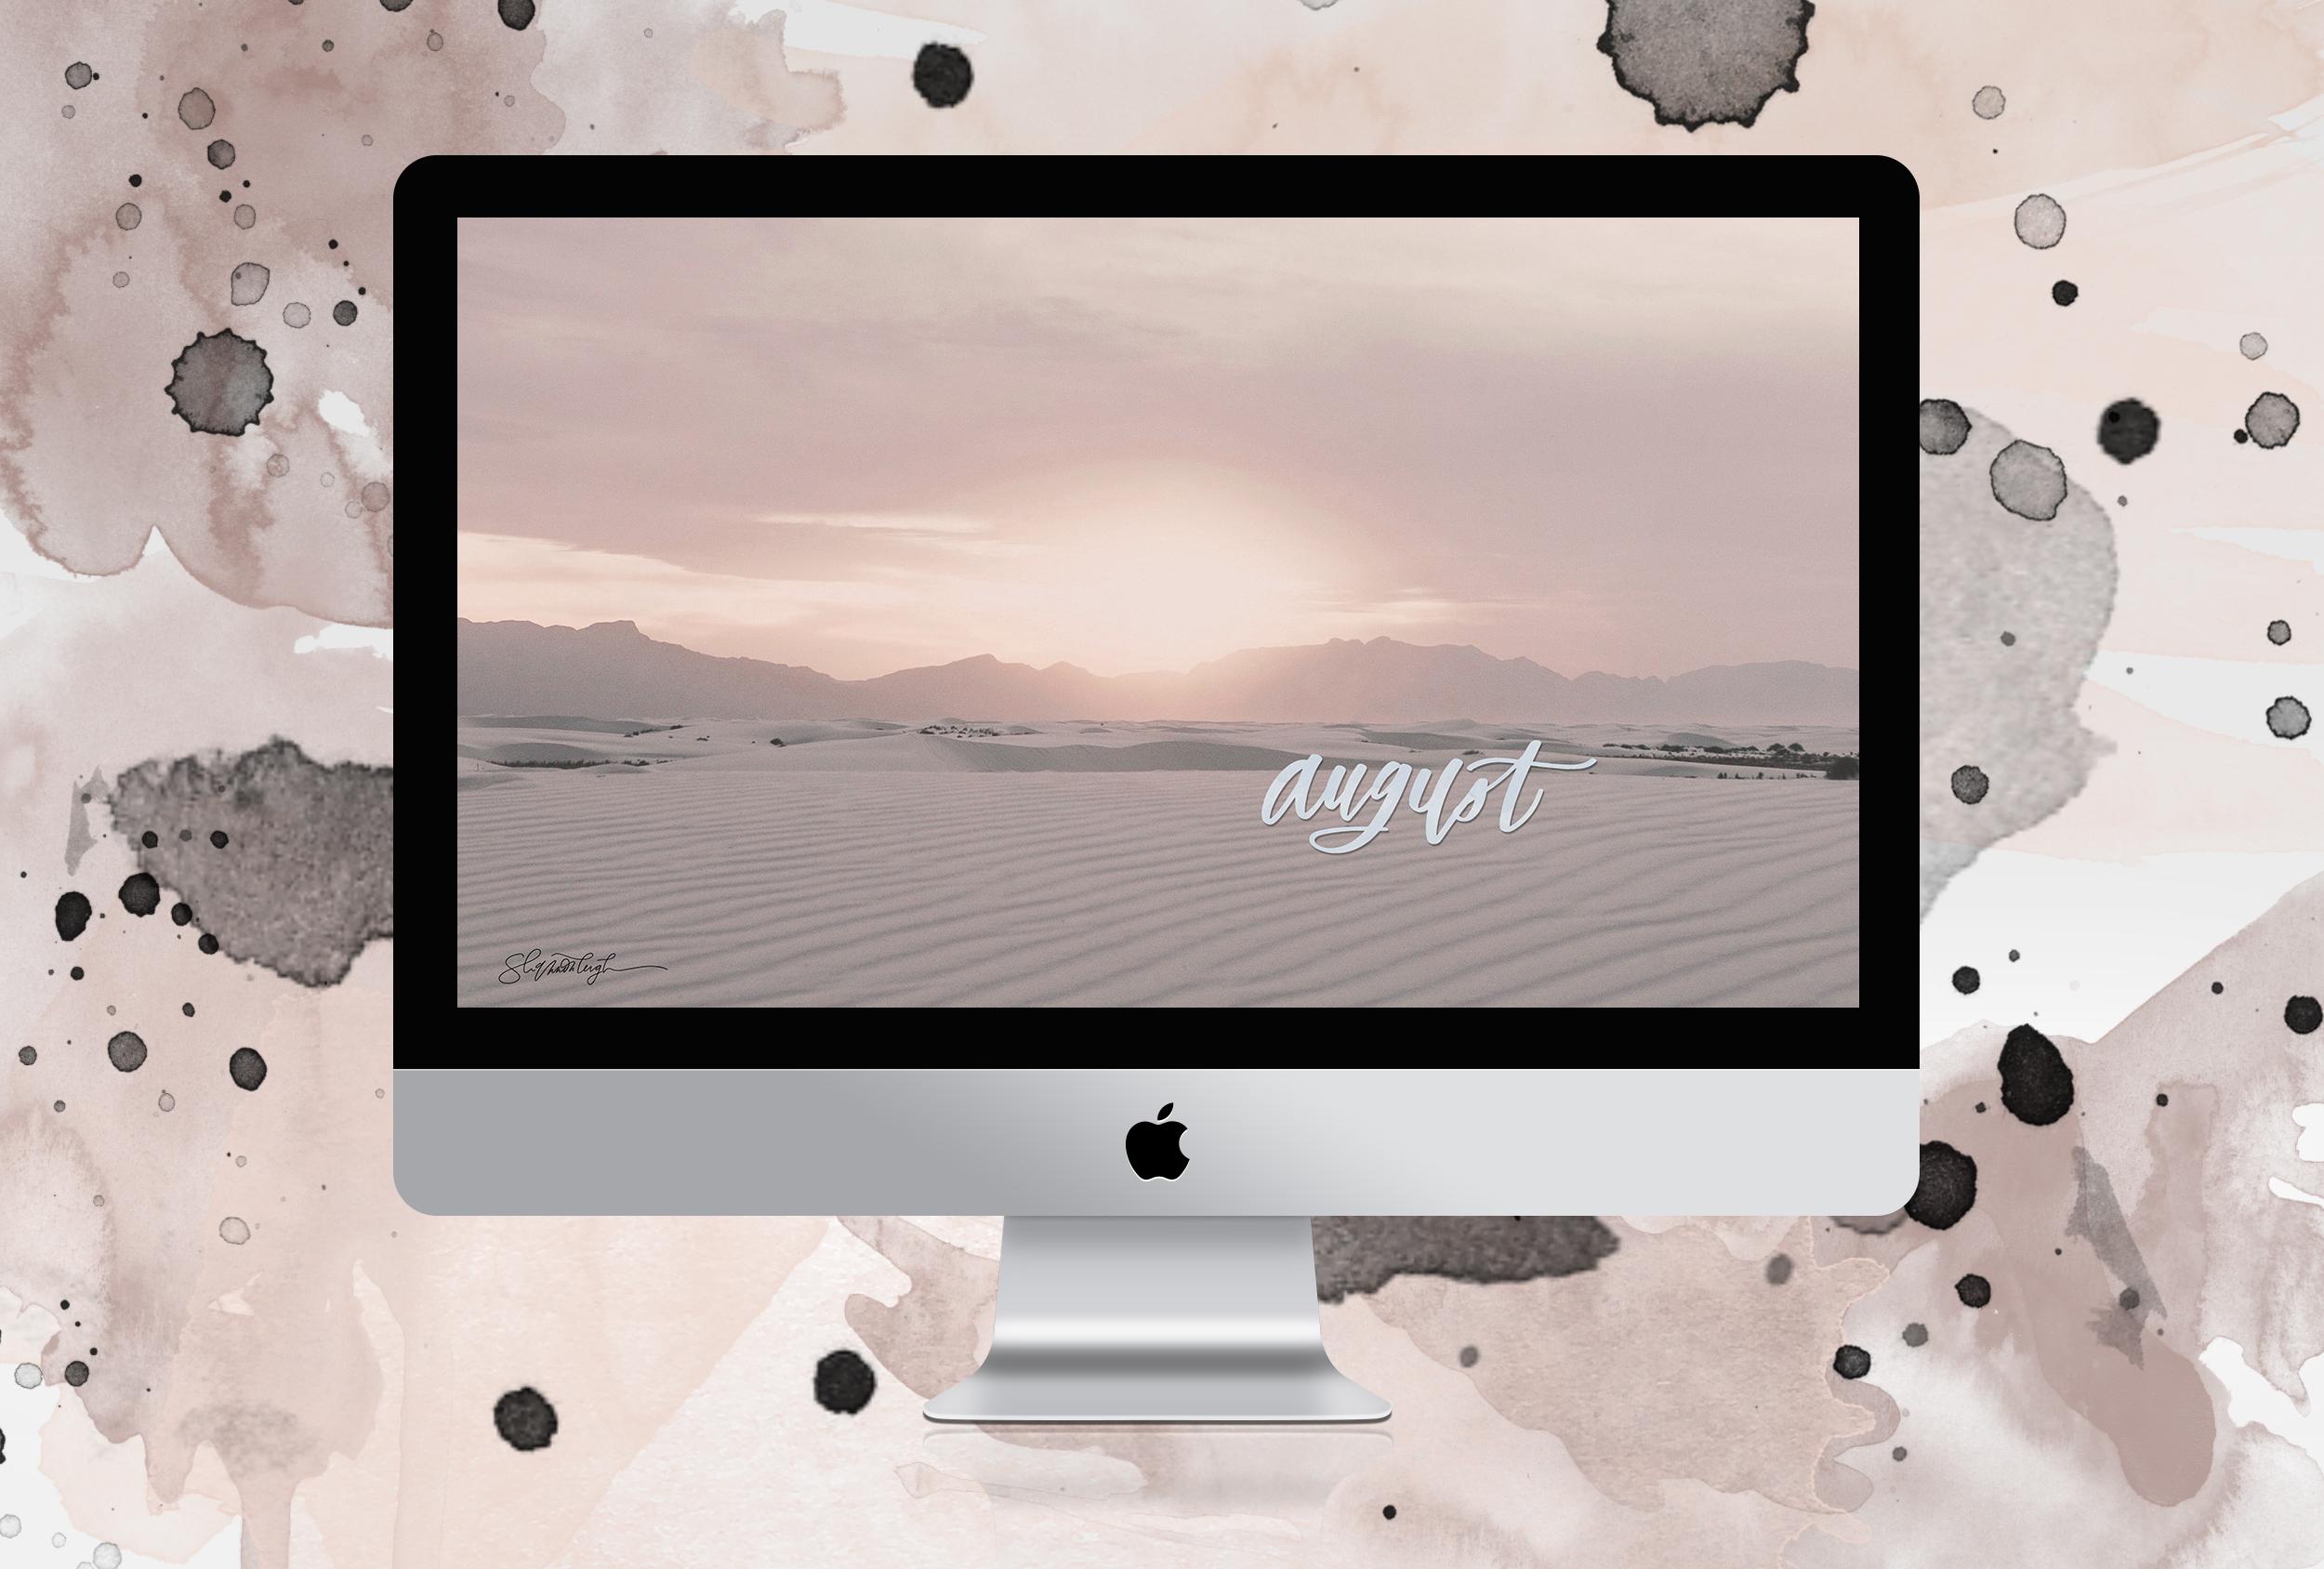 iMac-psd-mockup-template-1 copy 3.jpg